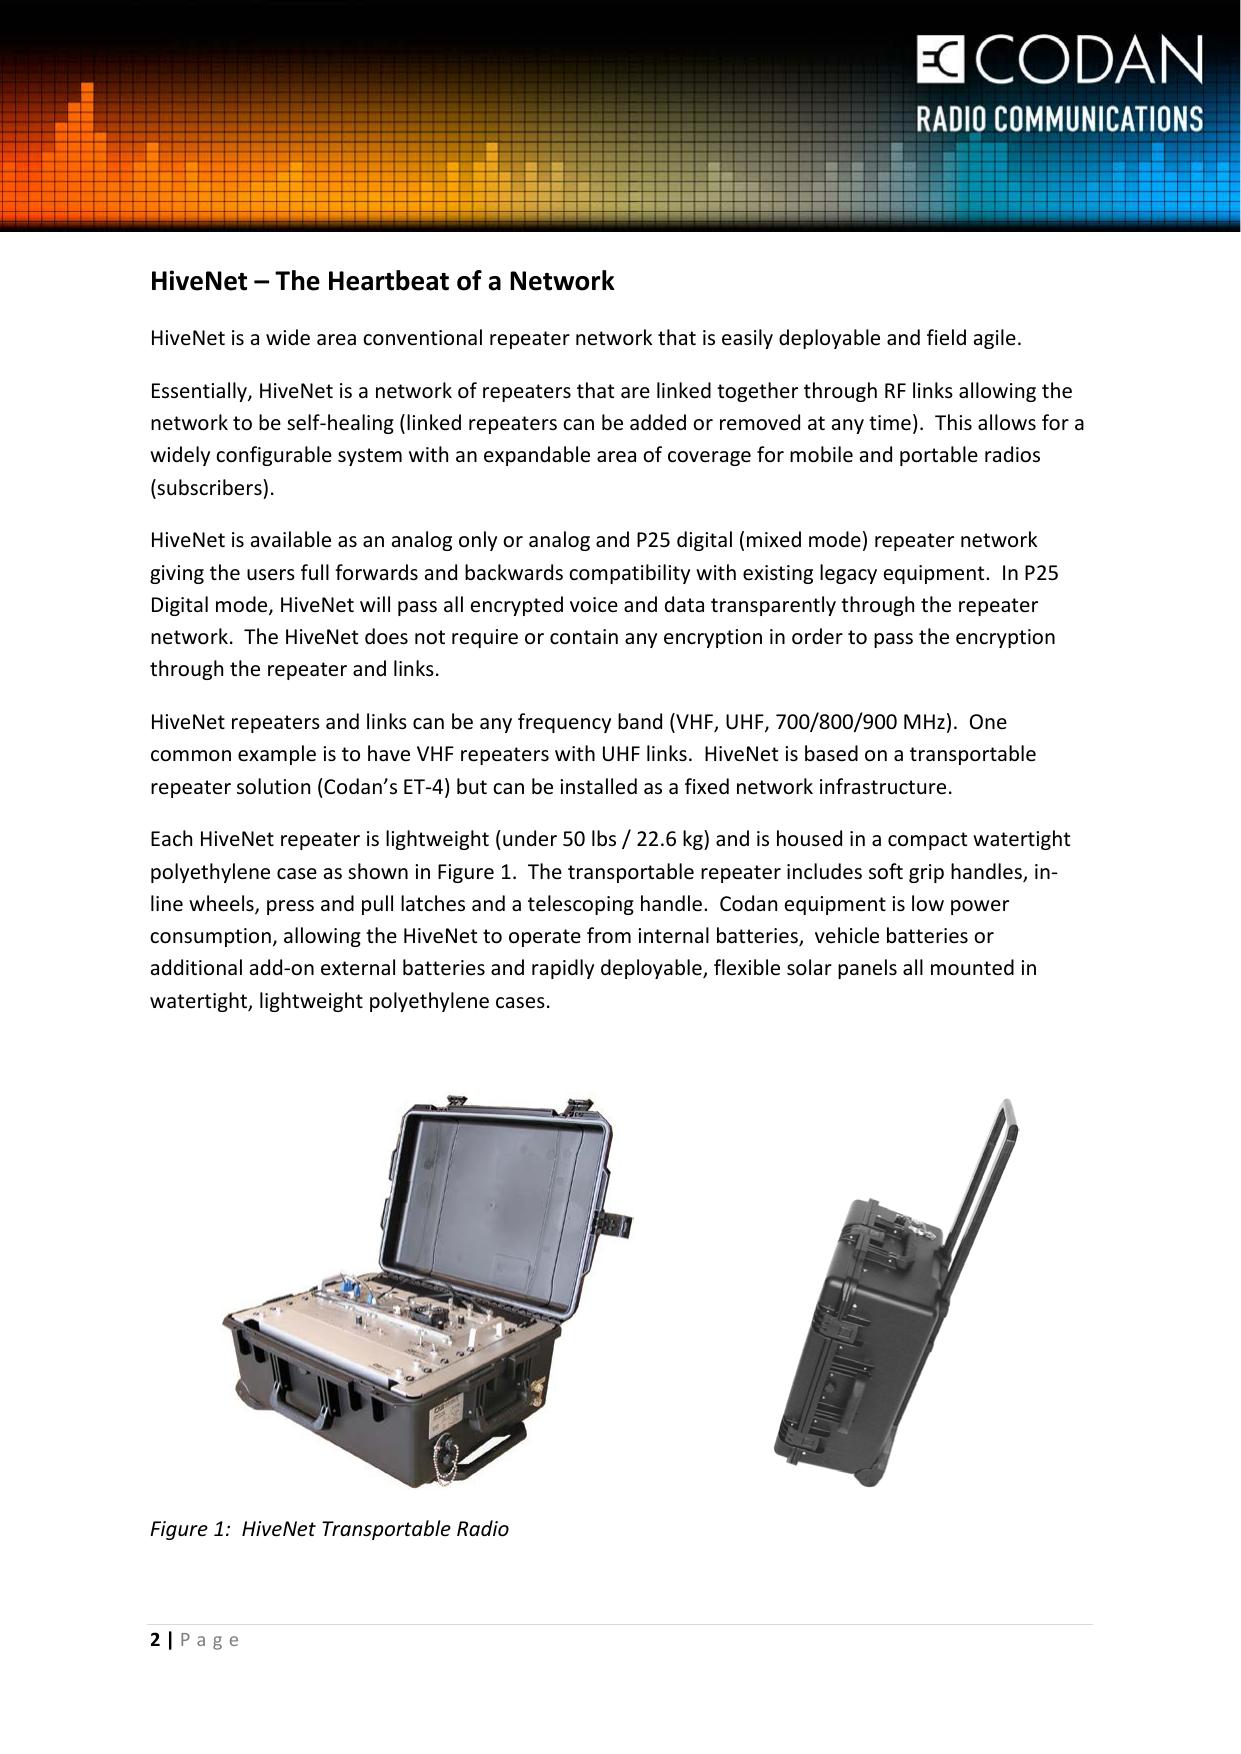 Hive Net: The Heartbeat Of A Network White Paper Codan Radio